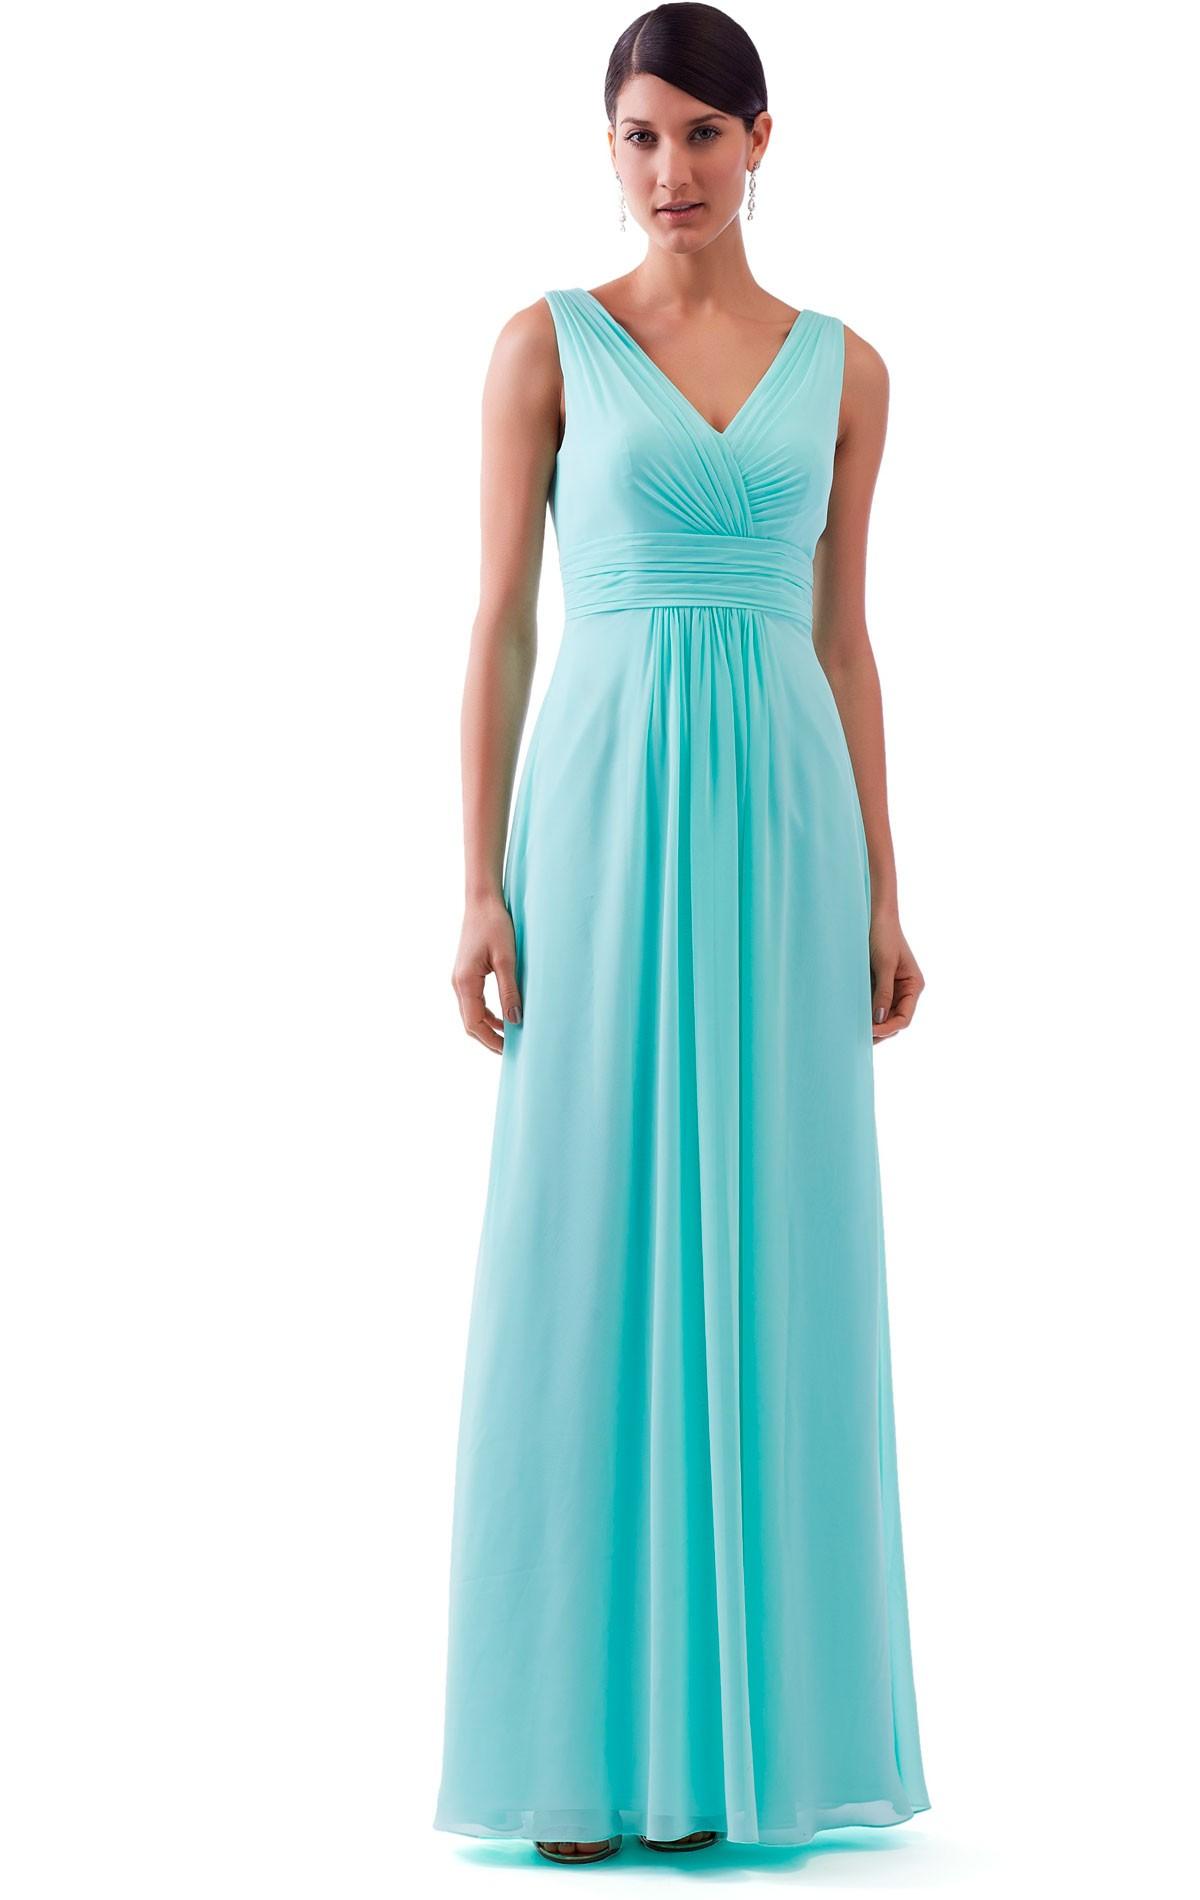 Buy Mint Green Bridesmaid Dresses - Down To Earth Bali